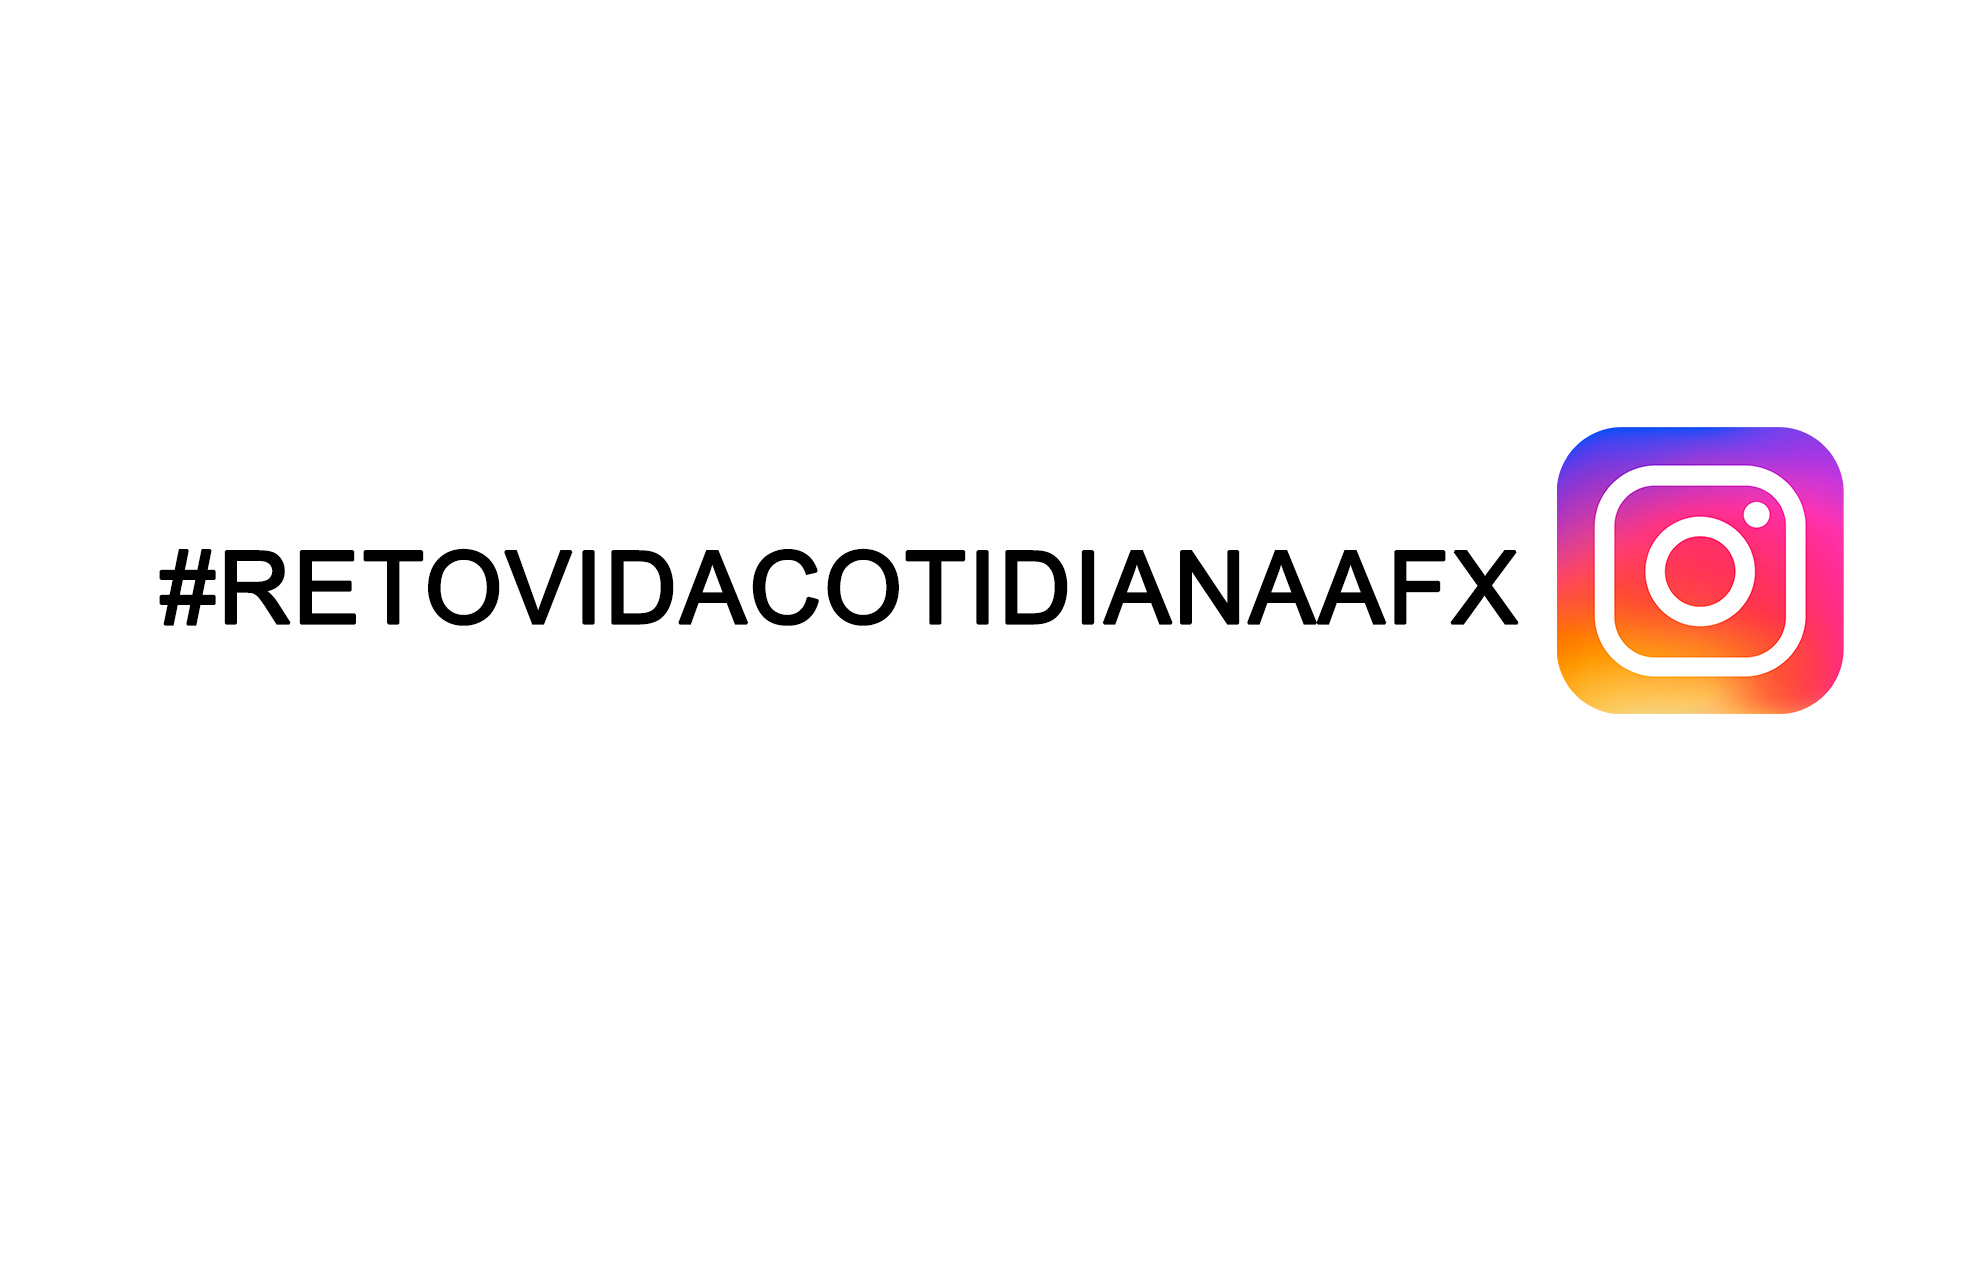 #RETOVIDACOTIDIANAAFX